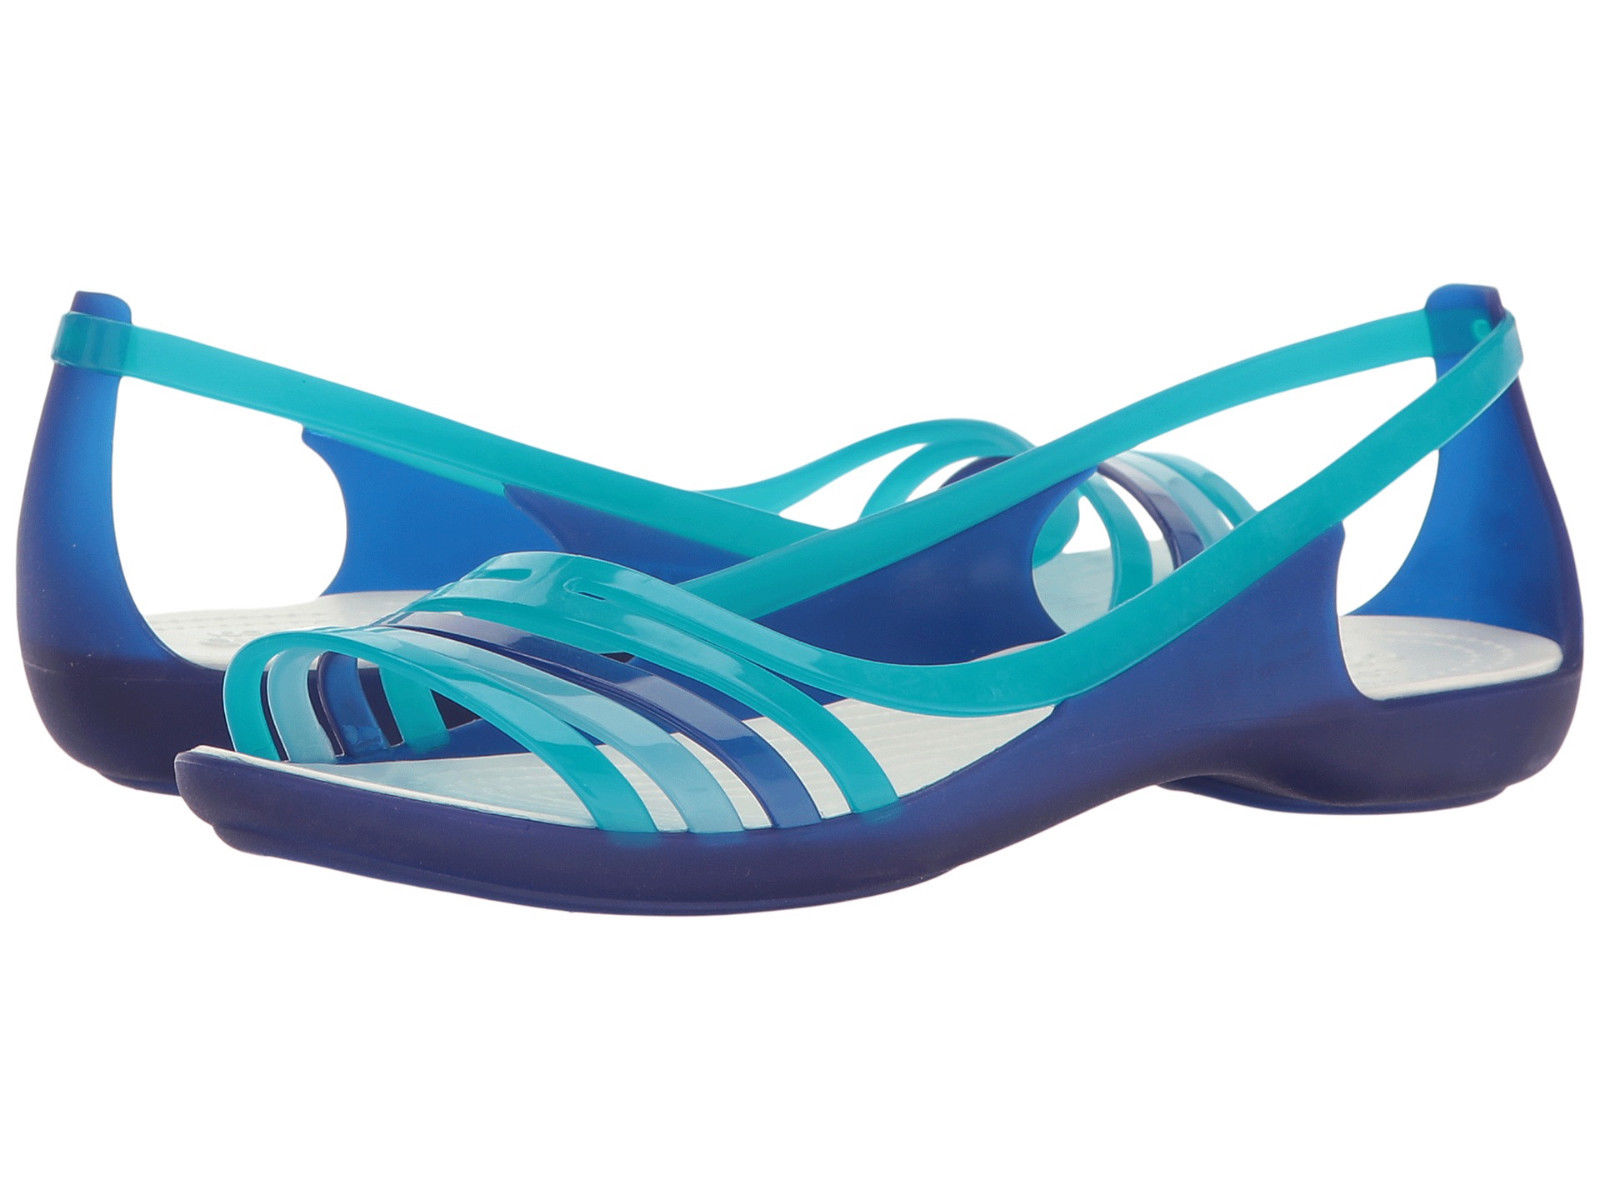 sandały Crocs Isabella Huarache Flat W Cerulean Blue 202463 4O7